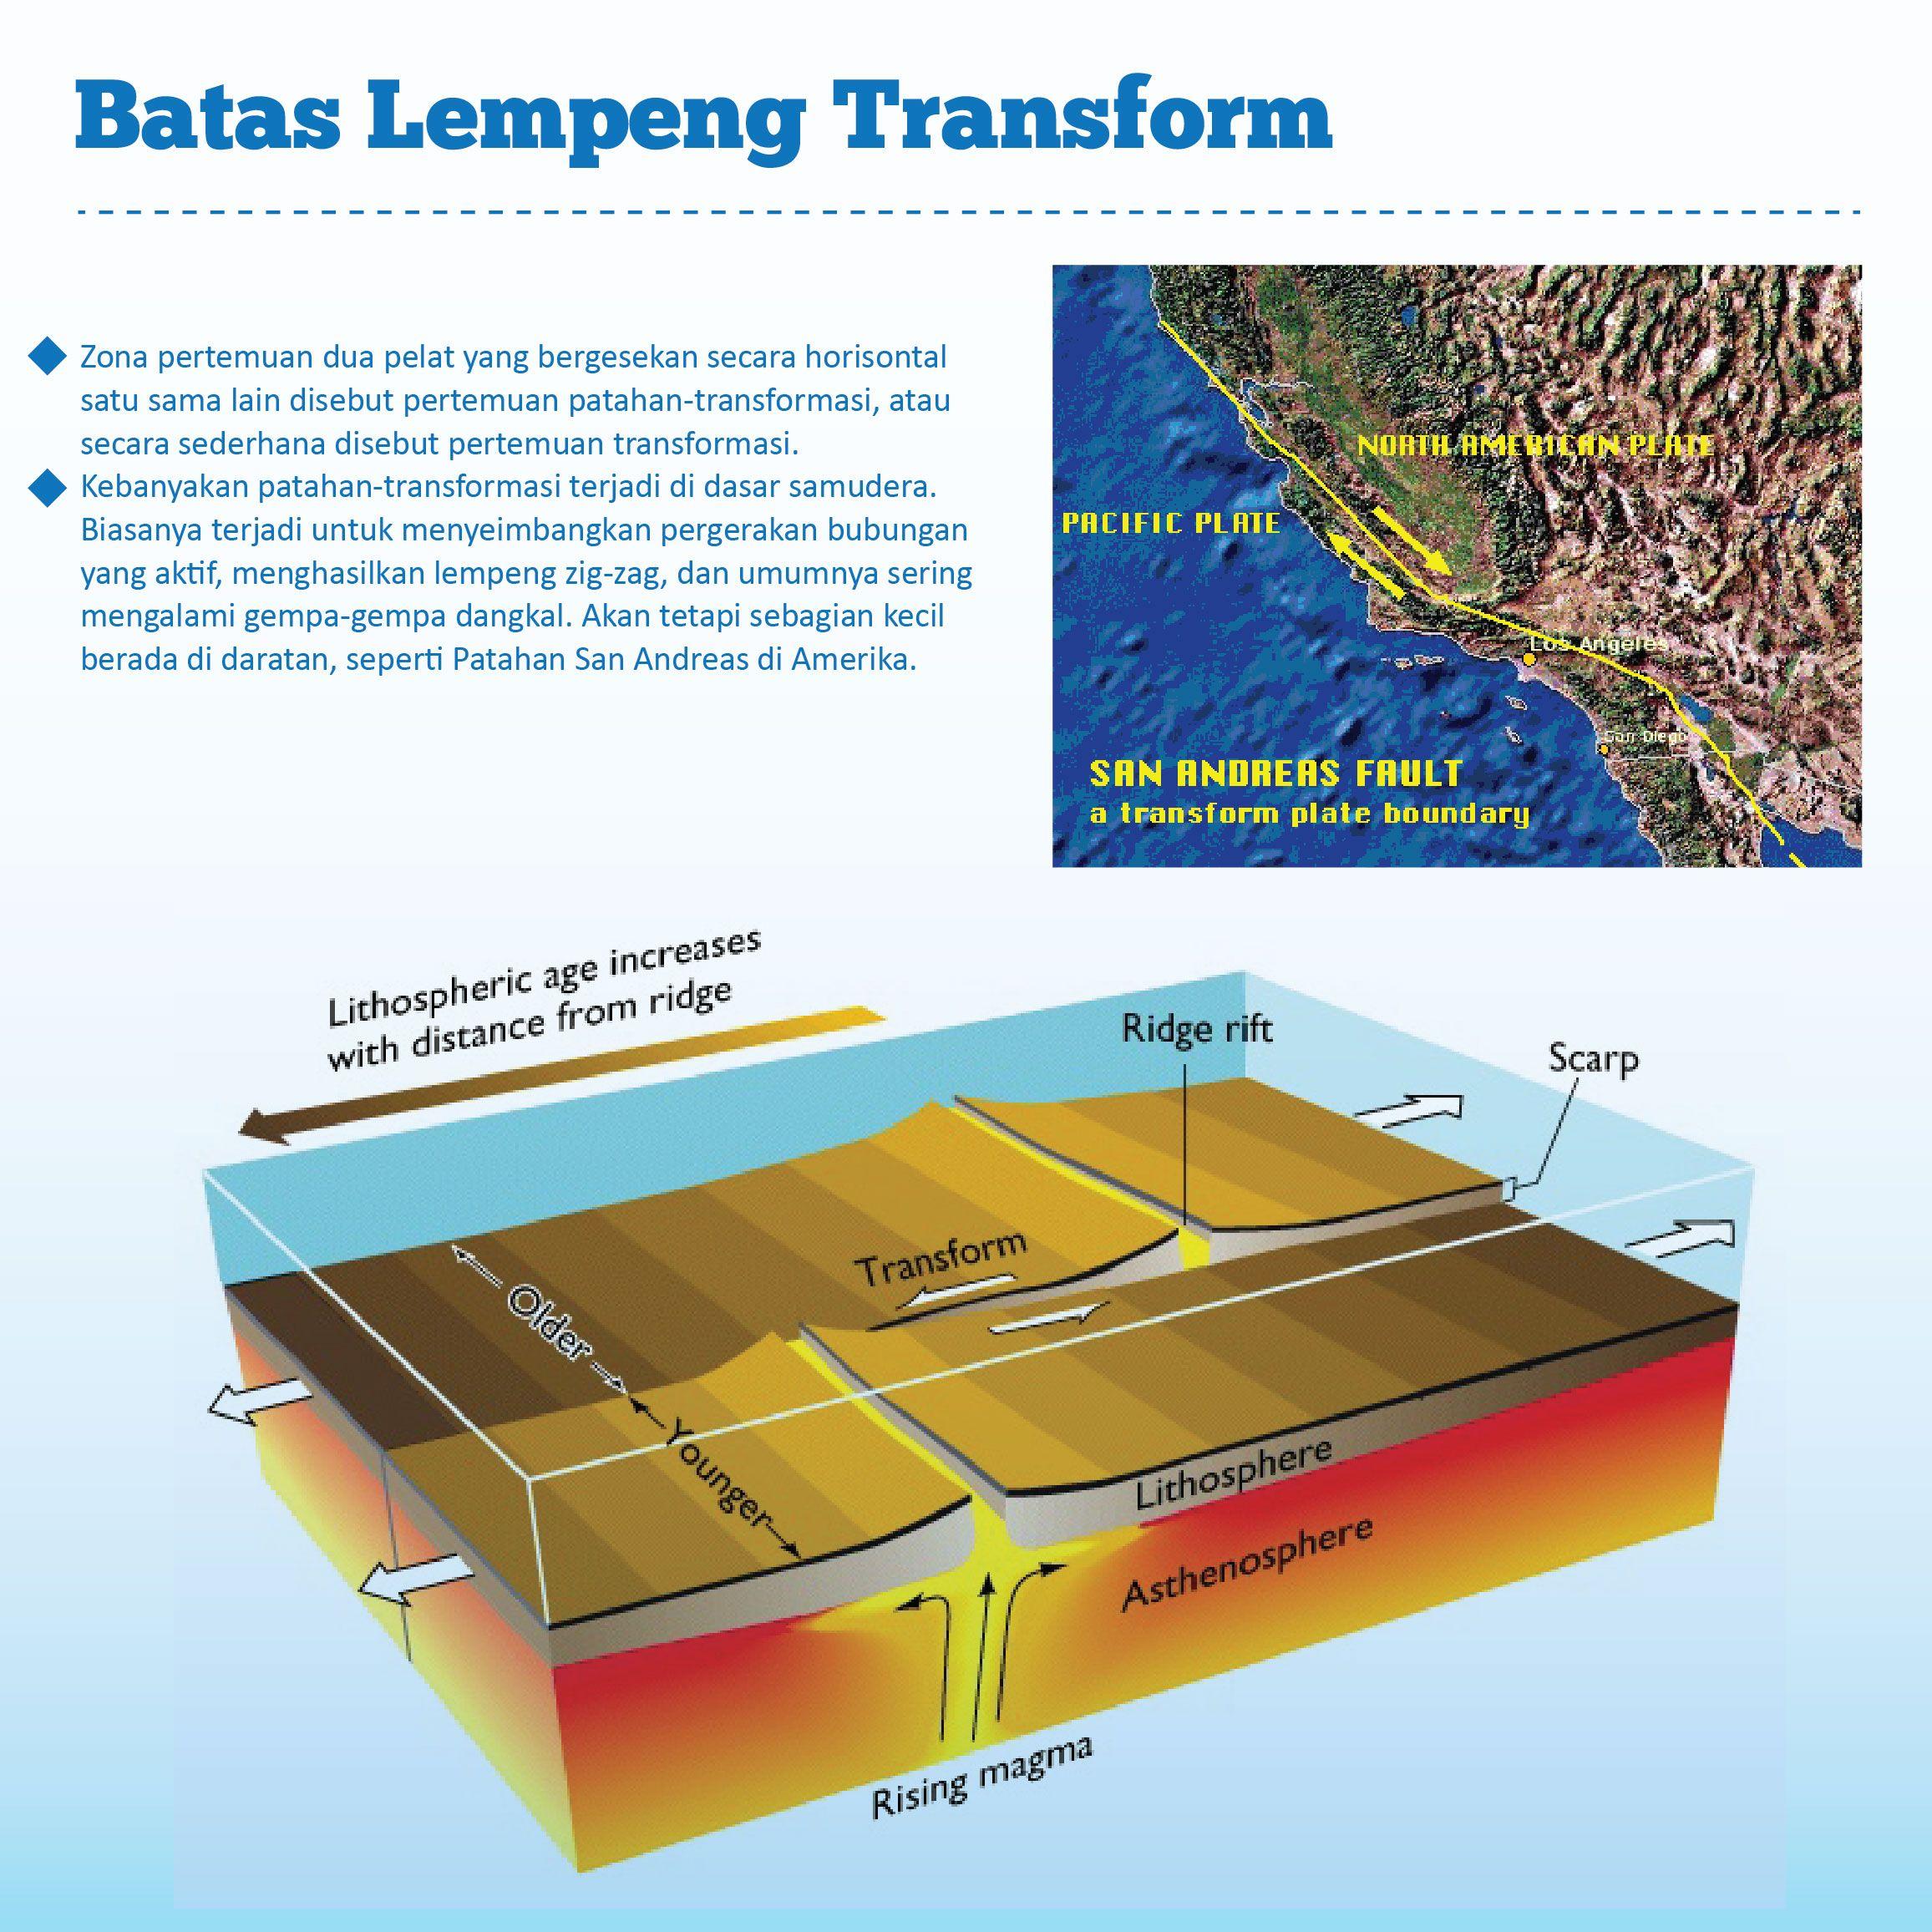 Batas Lempeng Transform Tsunami Persamaan